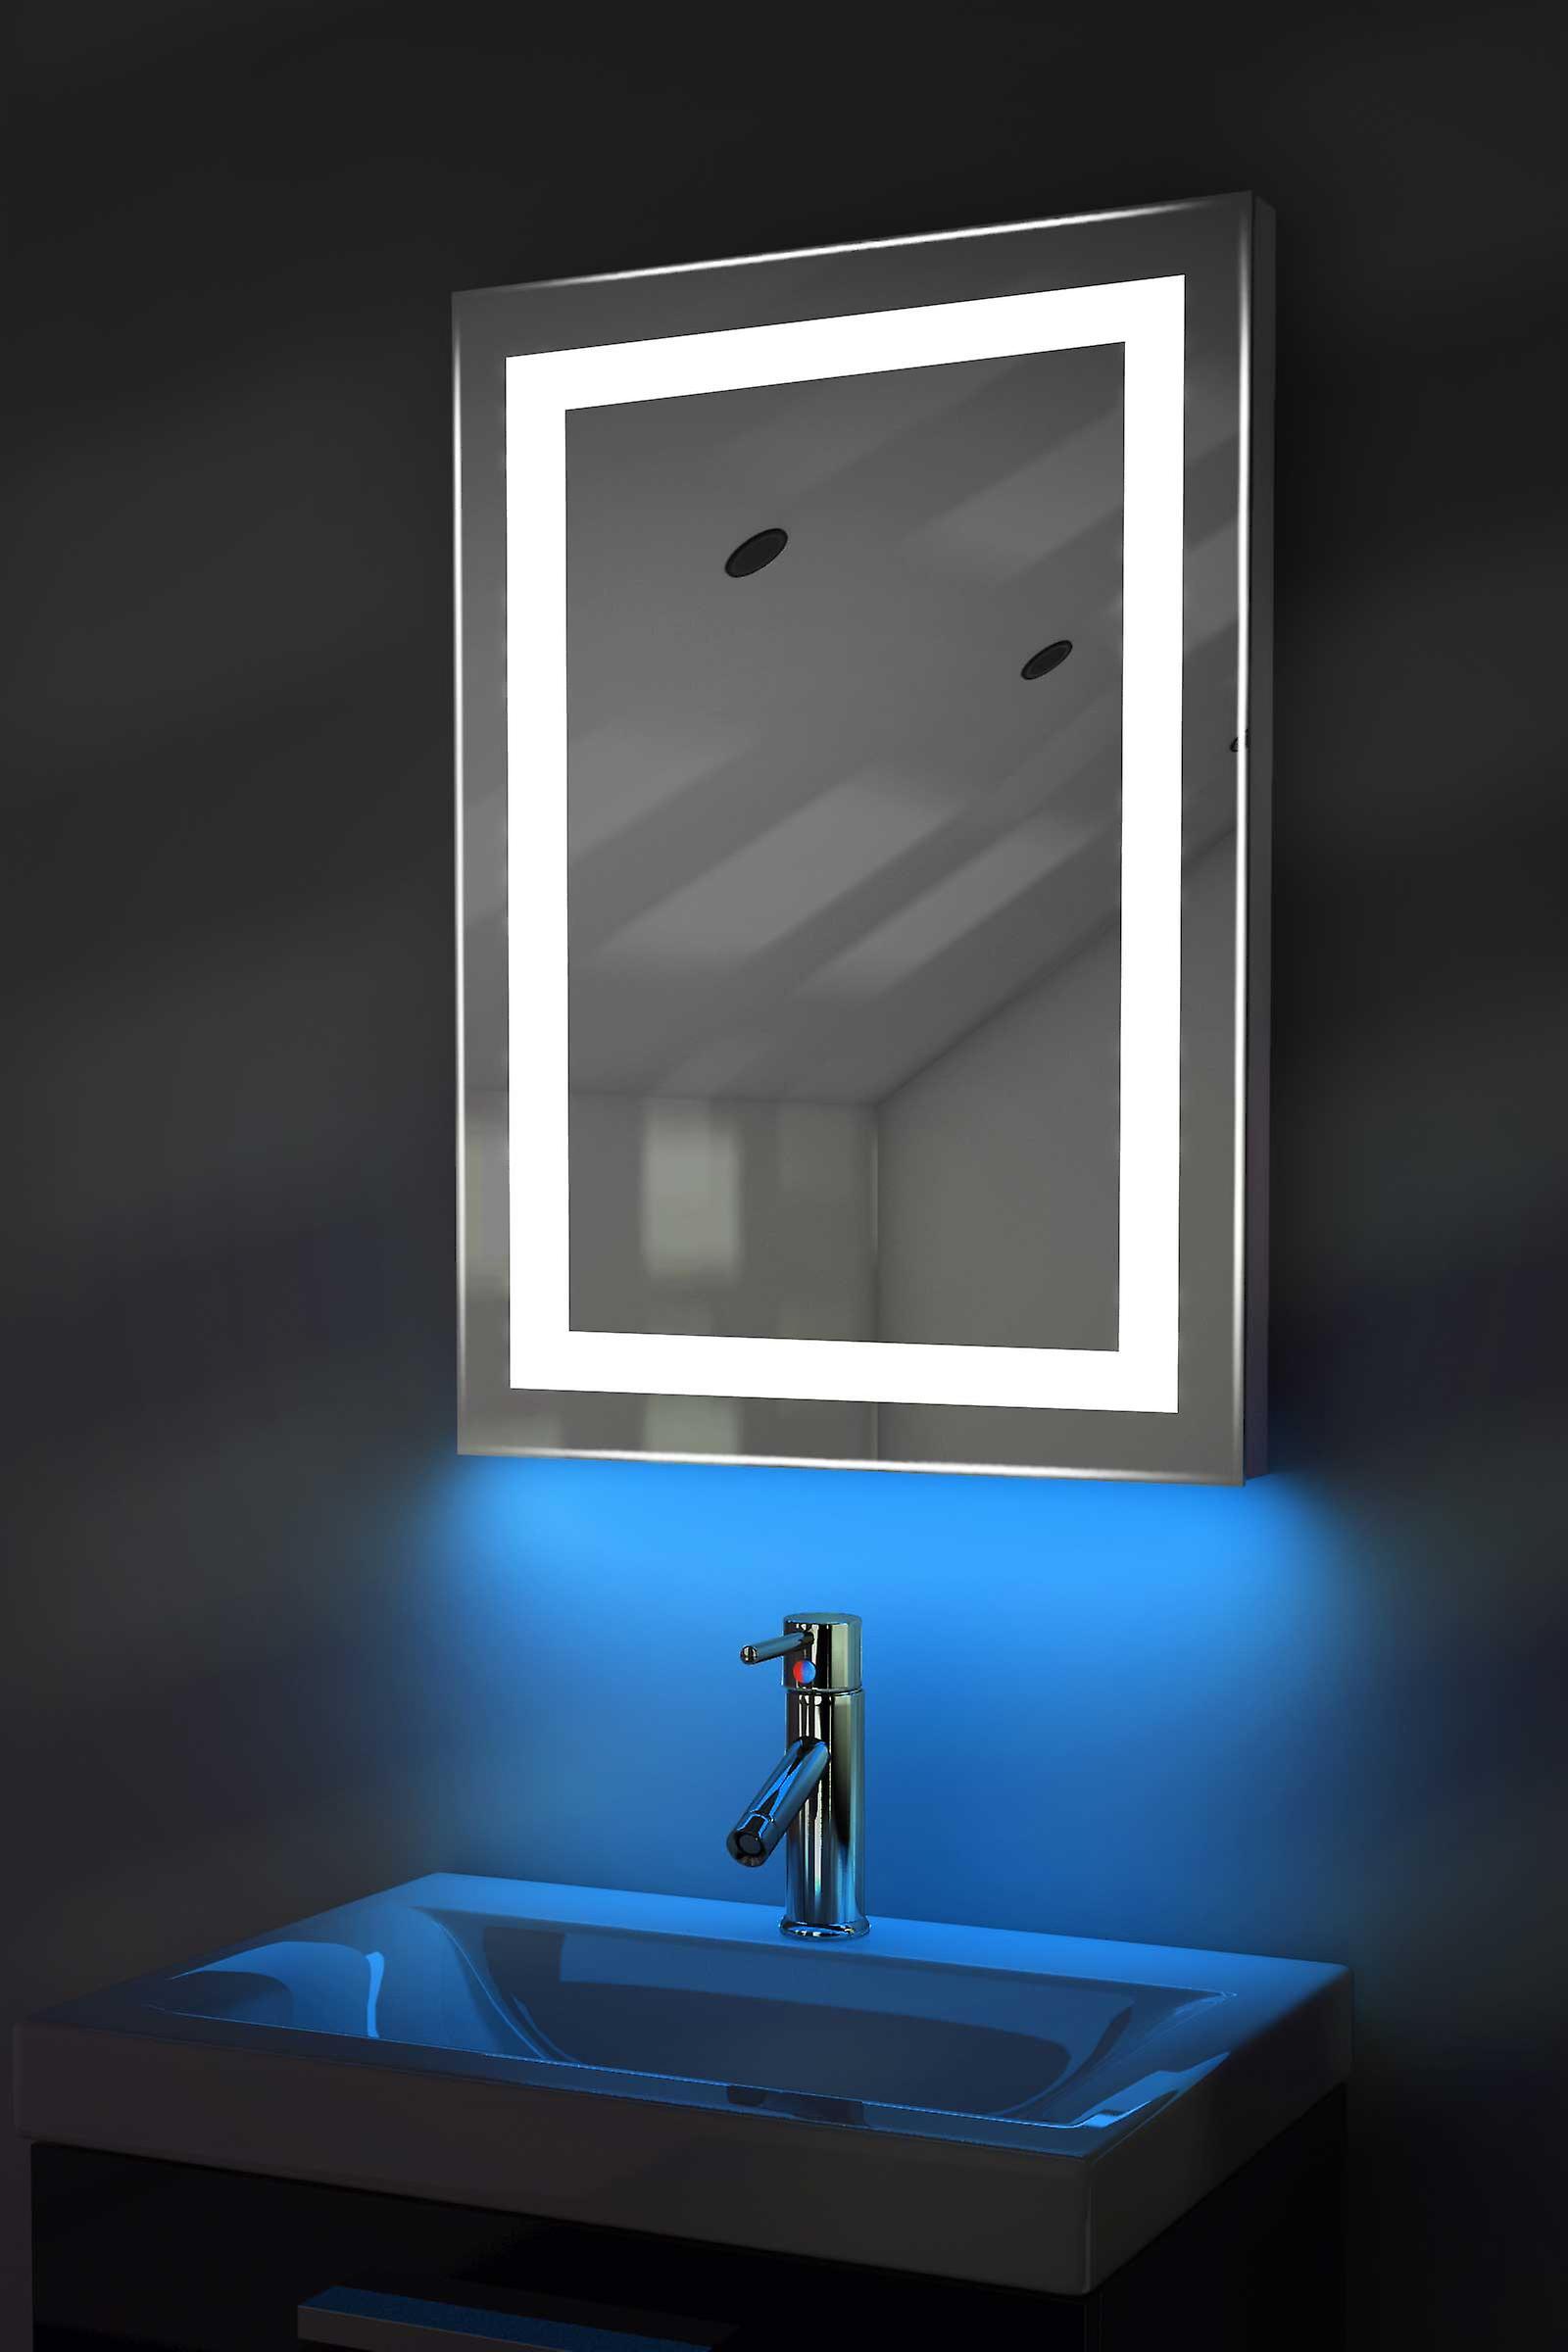 Ambient Shaver LED Bathroom Mirror With Demister Pad & Sensor k160iw